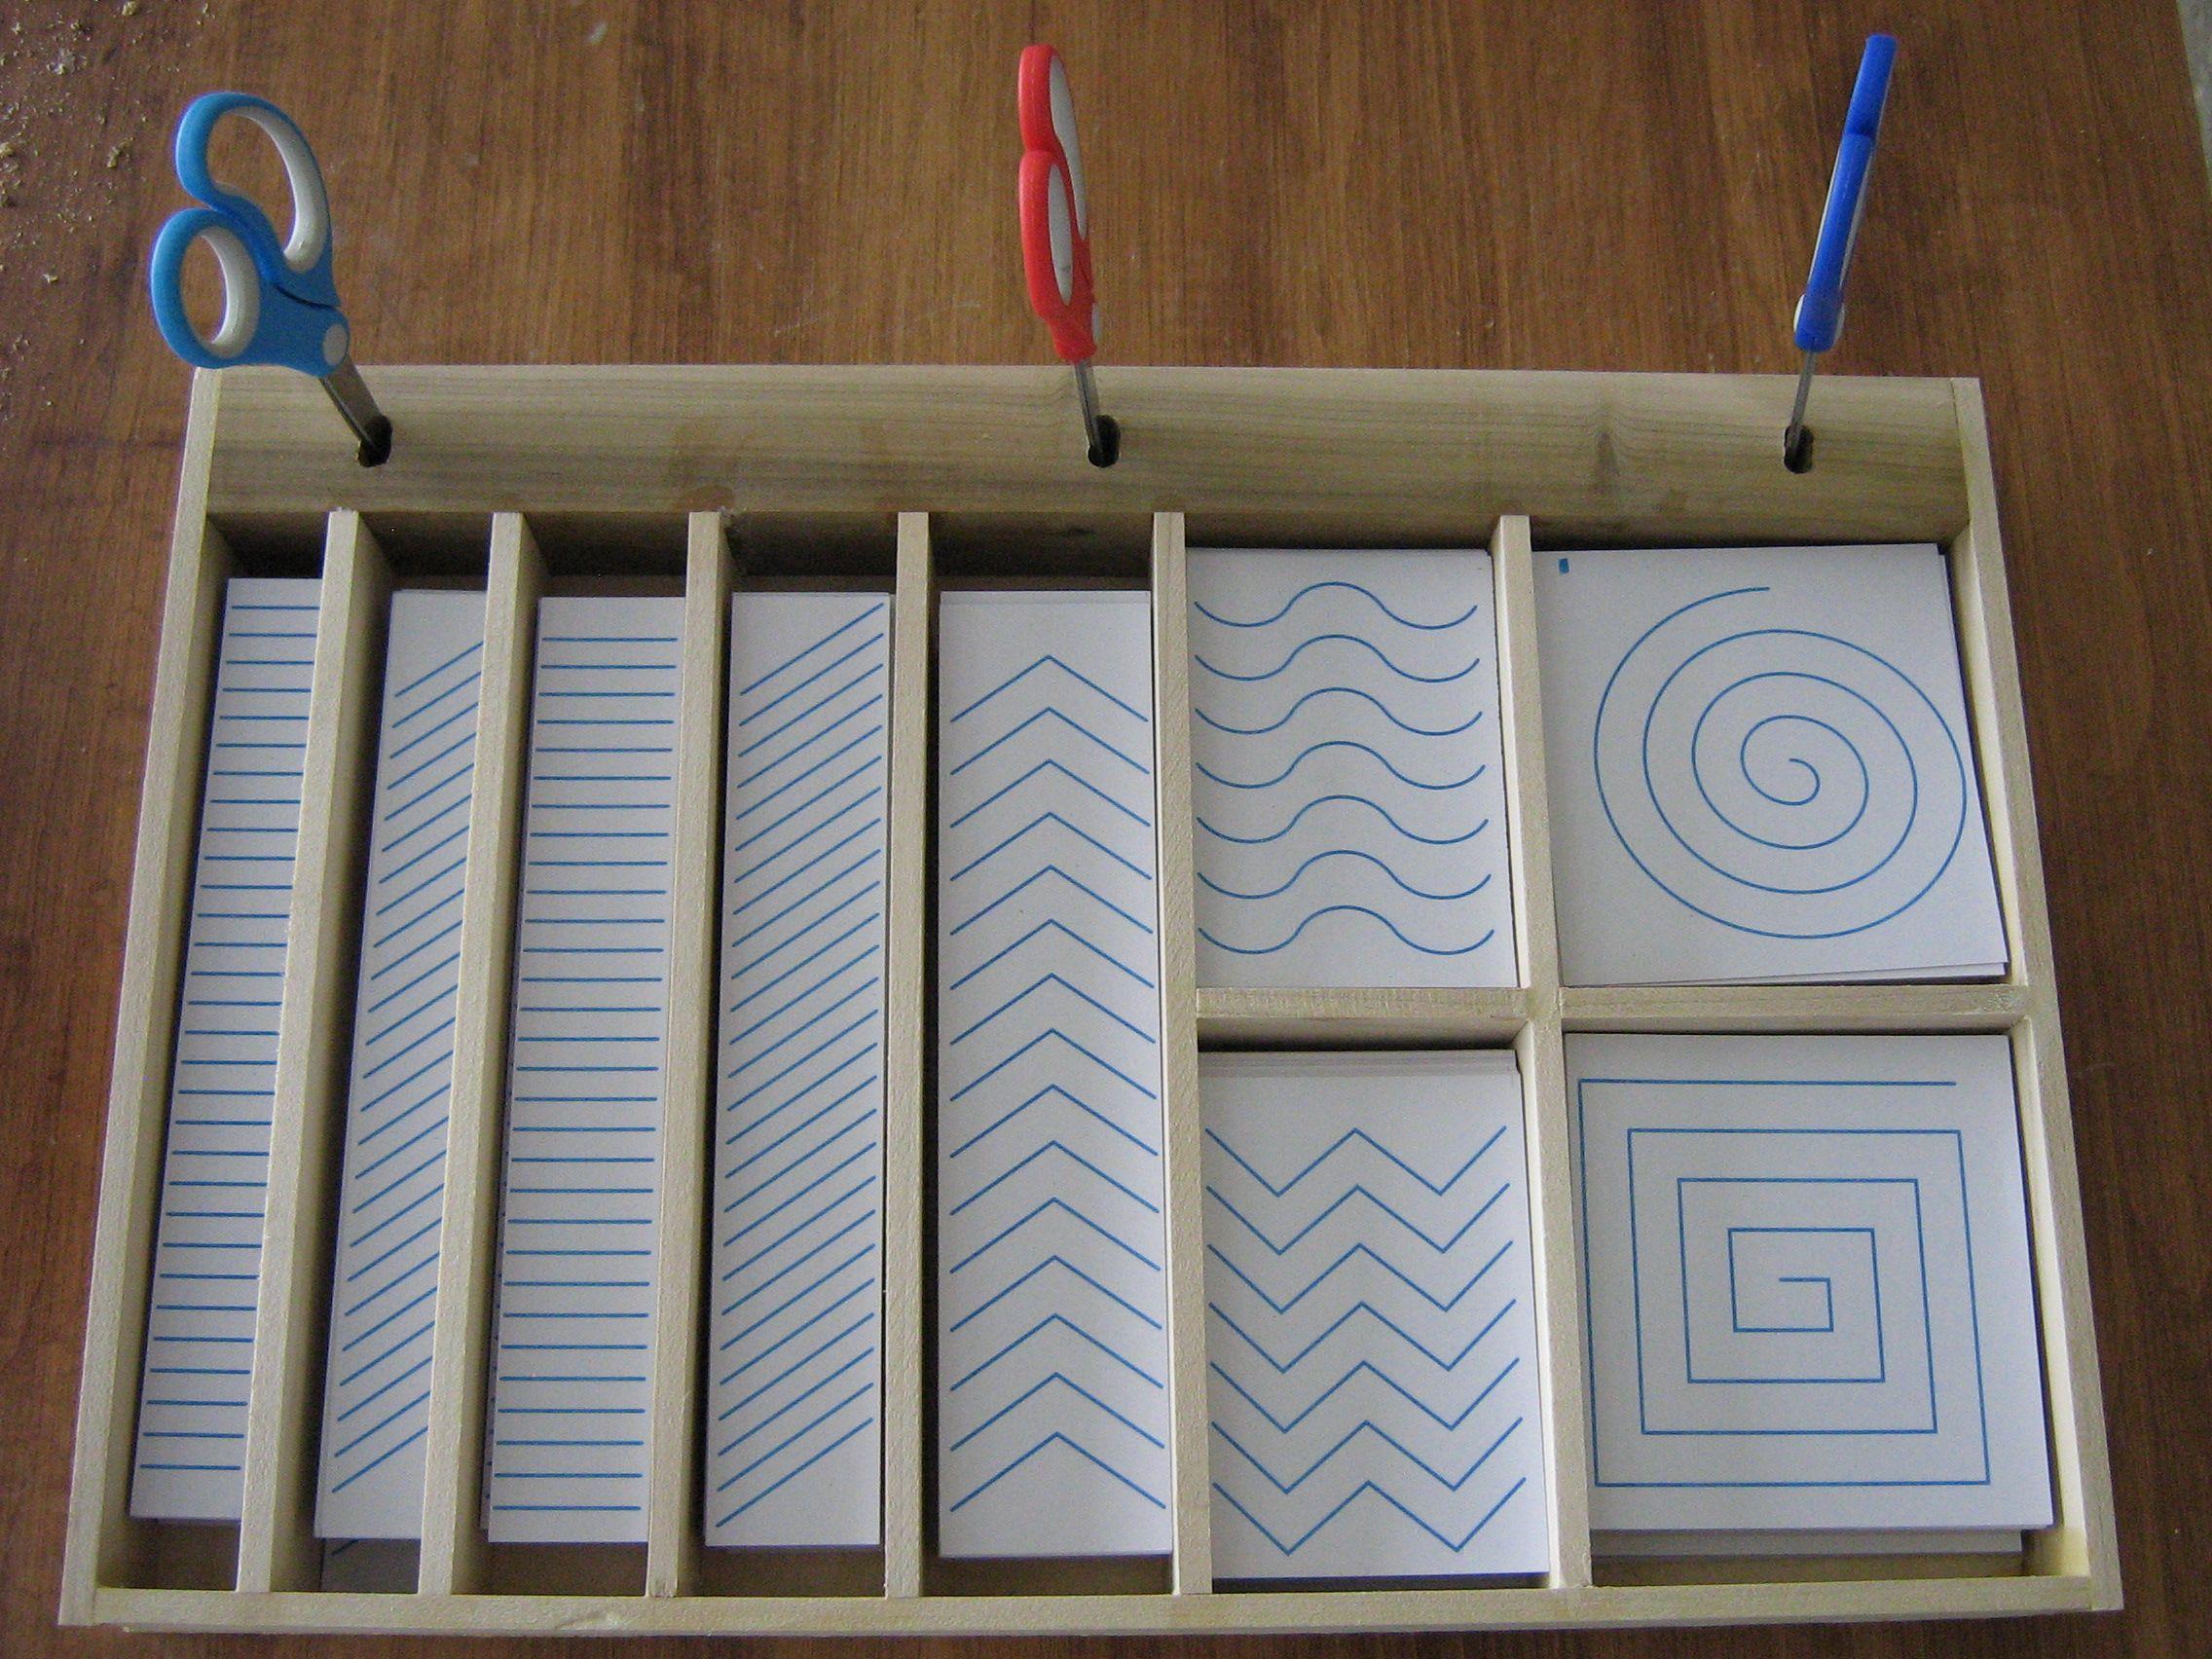 Pin On Montessori Homeschooling